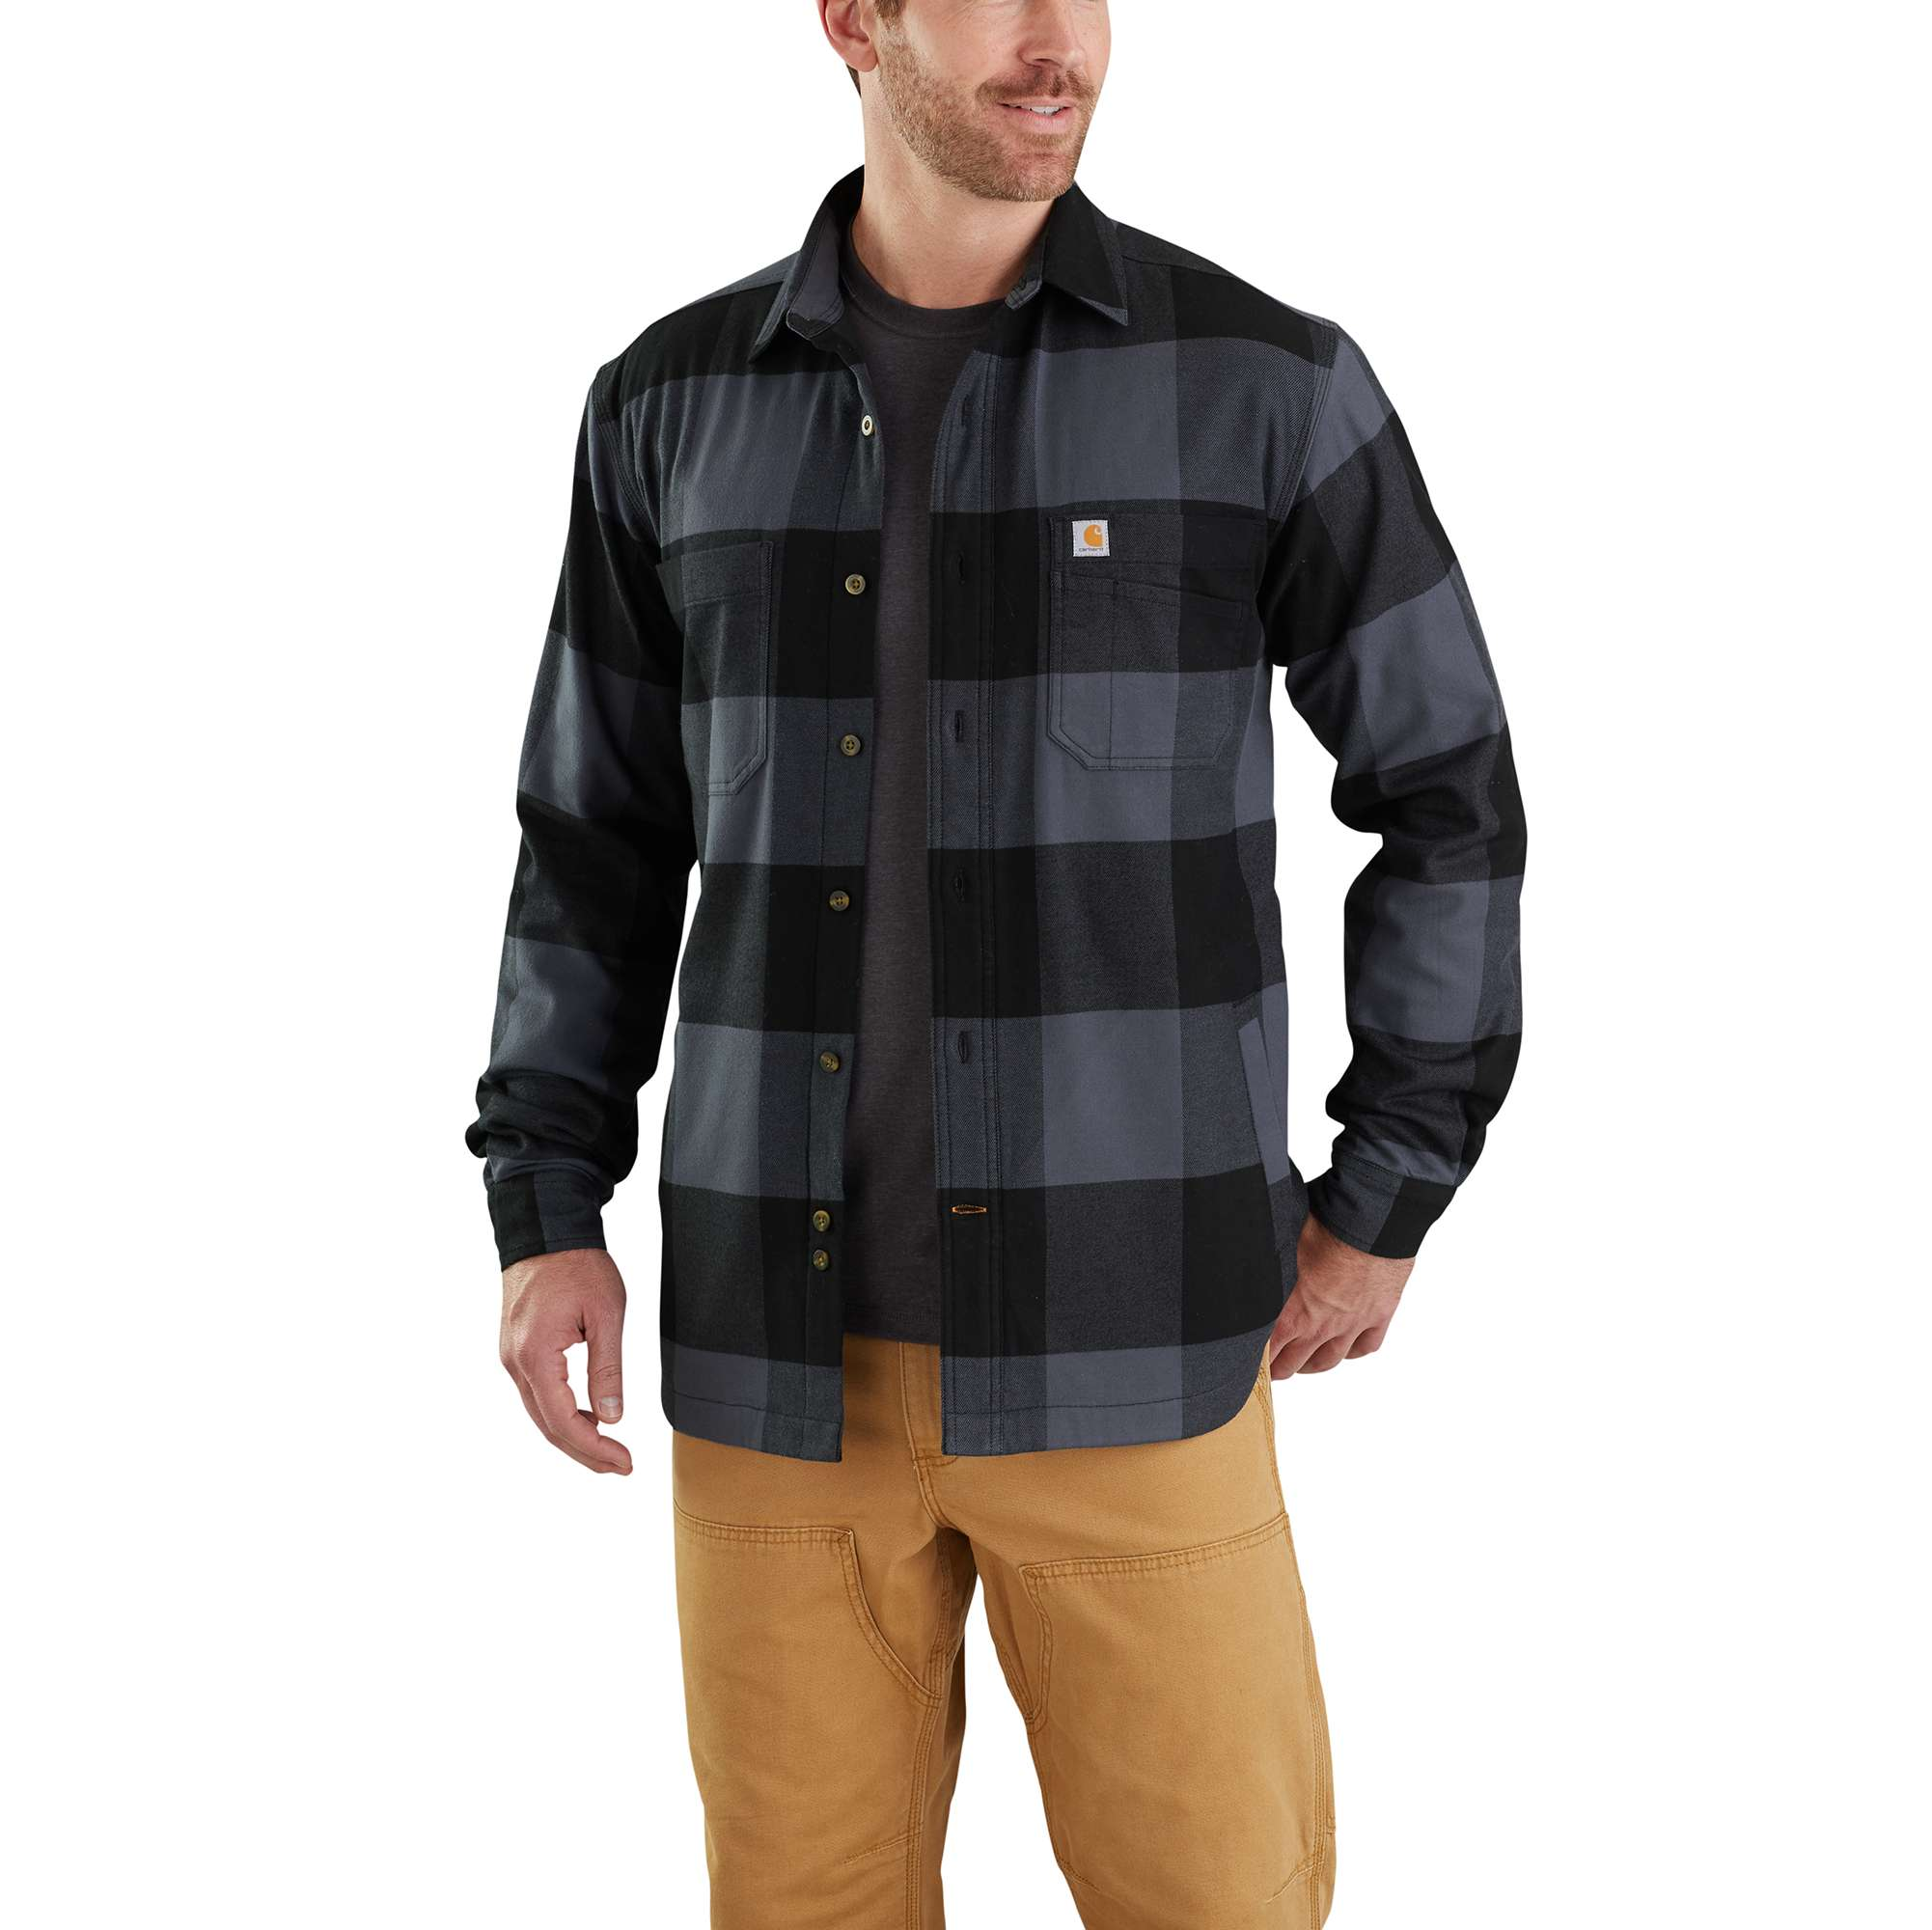 Carhartt Rugged Flex Hamilton Fleece-Lined Shirt Jac